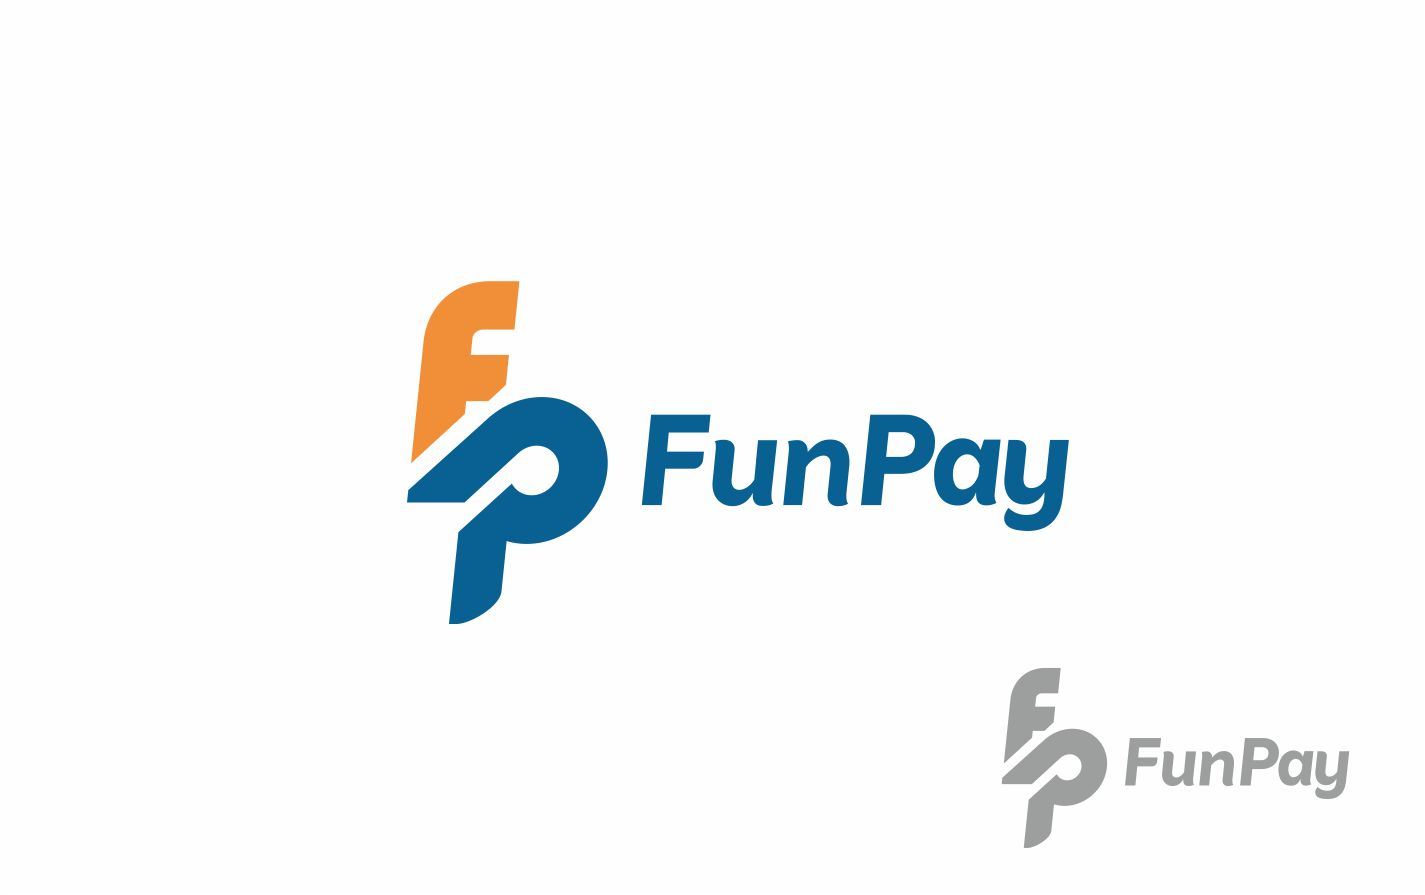 Логотип для FunPay.ru фото f_675599296e98354f.jpg